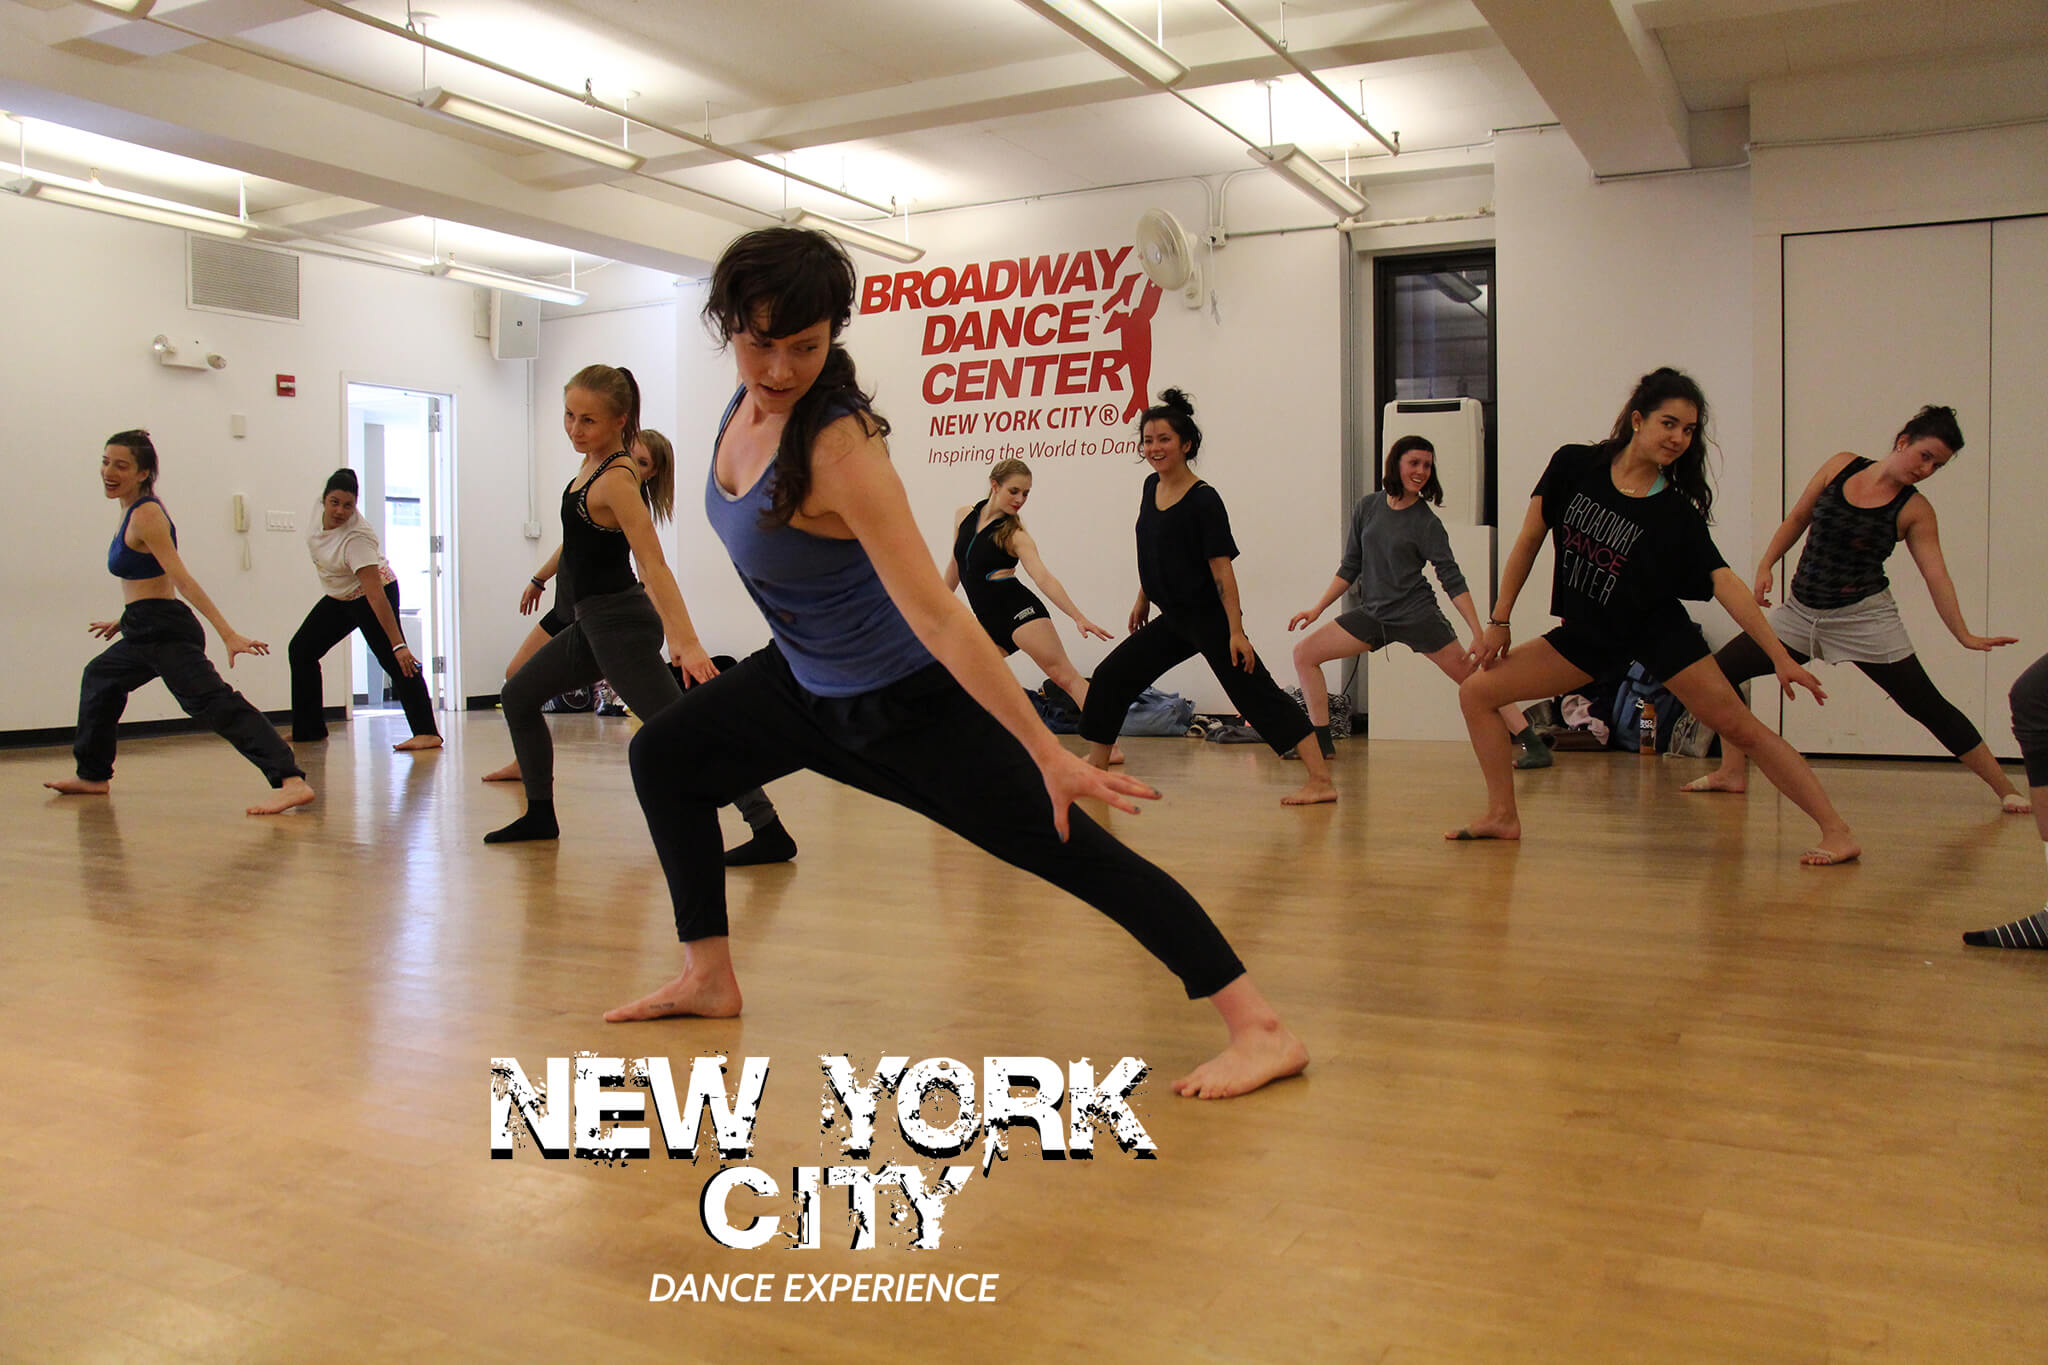 New York City Dance Experience